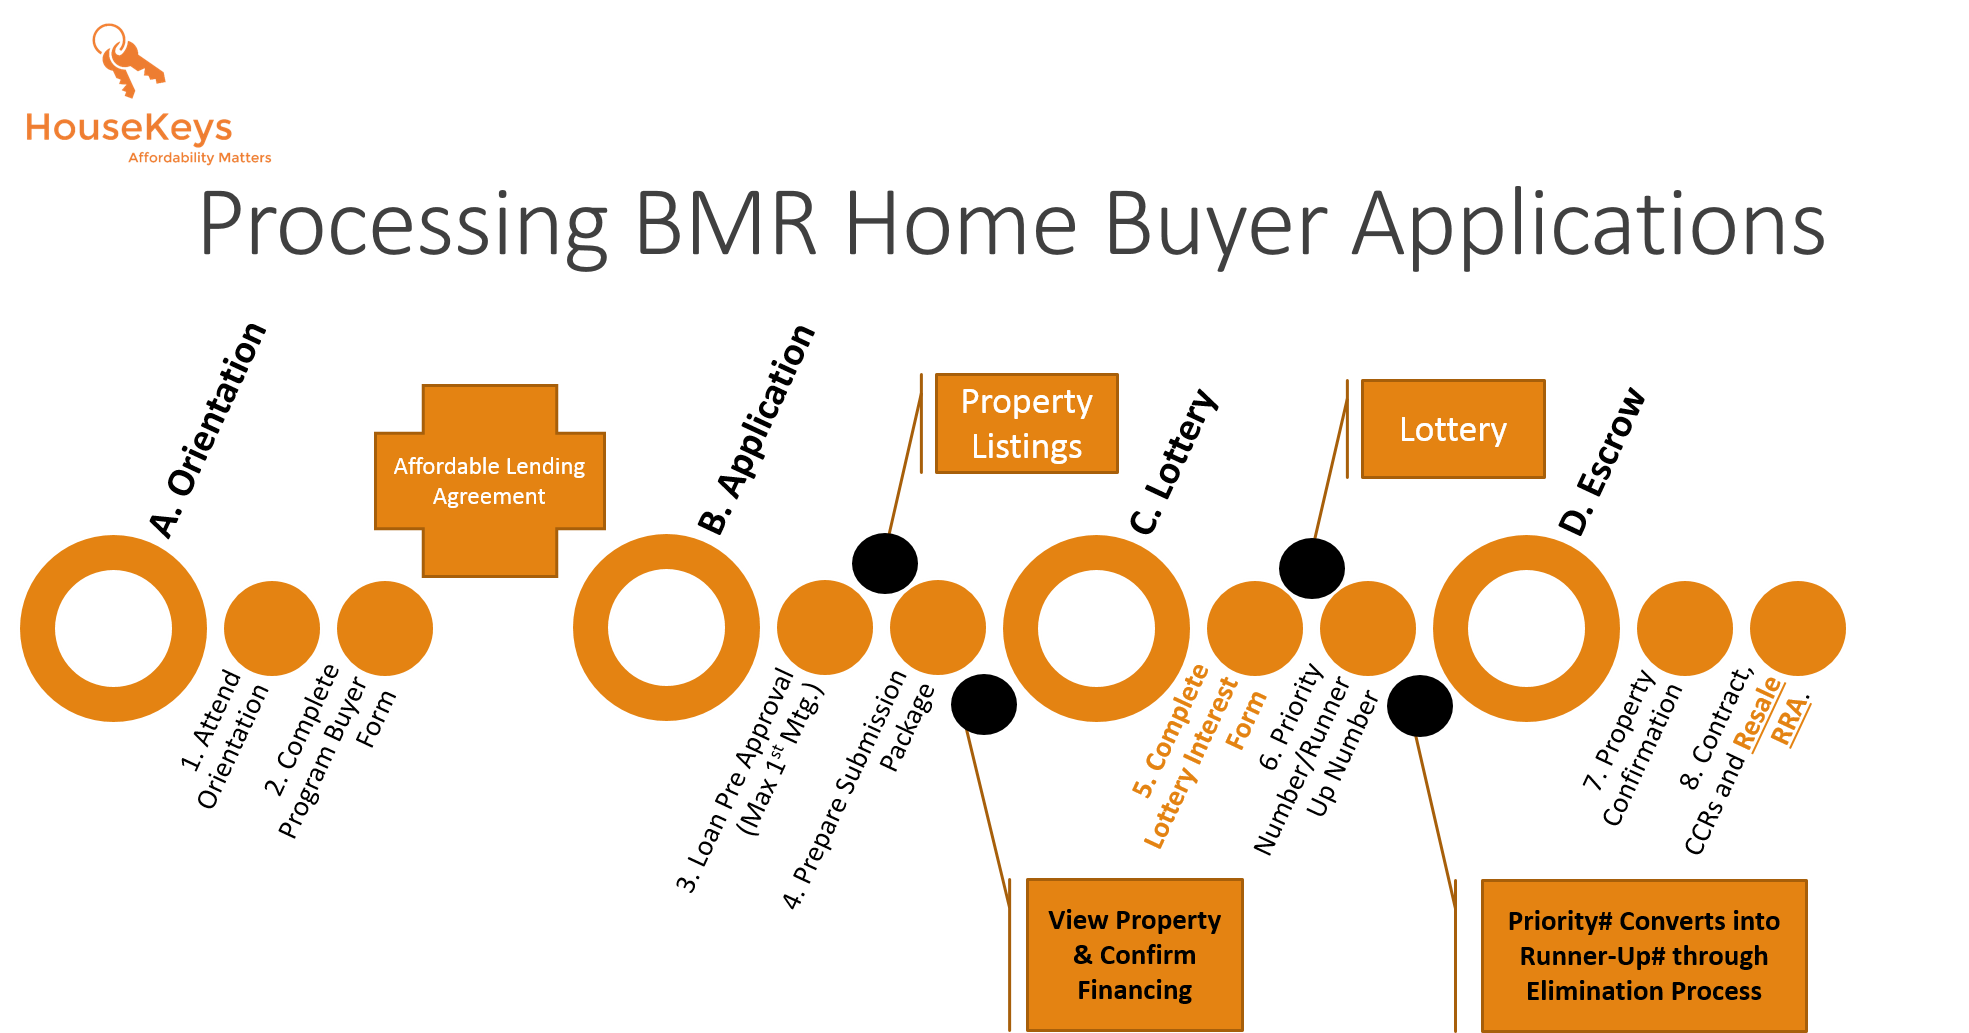 HouseKeys Homebuyer Process (DRAFT)